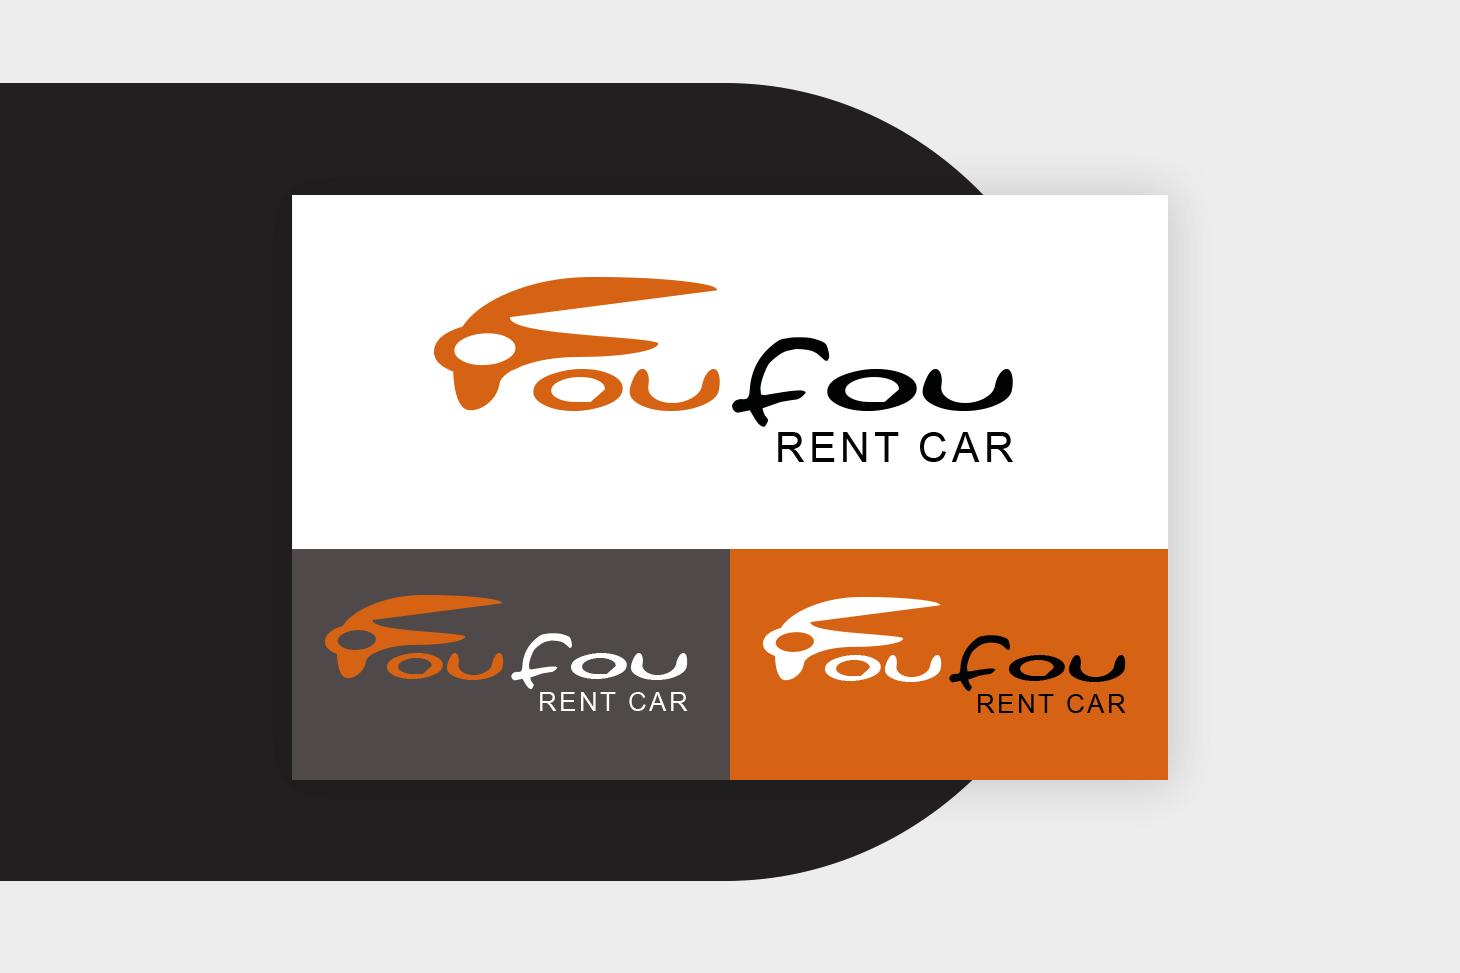 Foufou Rent Car